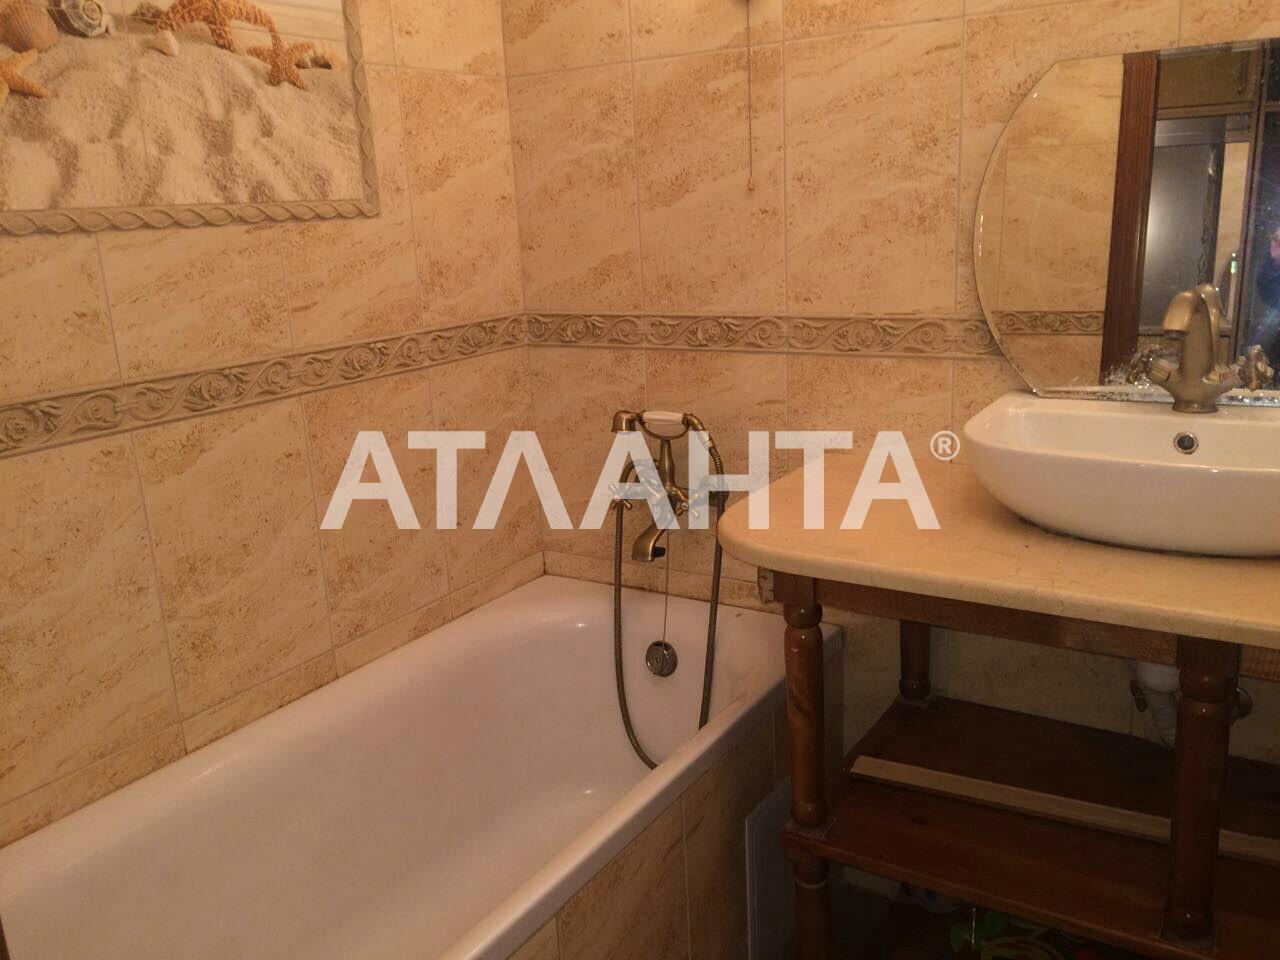 Продается 3-комнатная Квартира на ул. Люстдорфская Дор. 27 — 42 000 у.е. (фото №8)